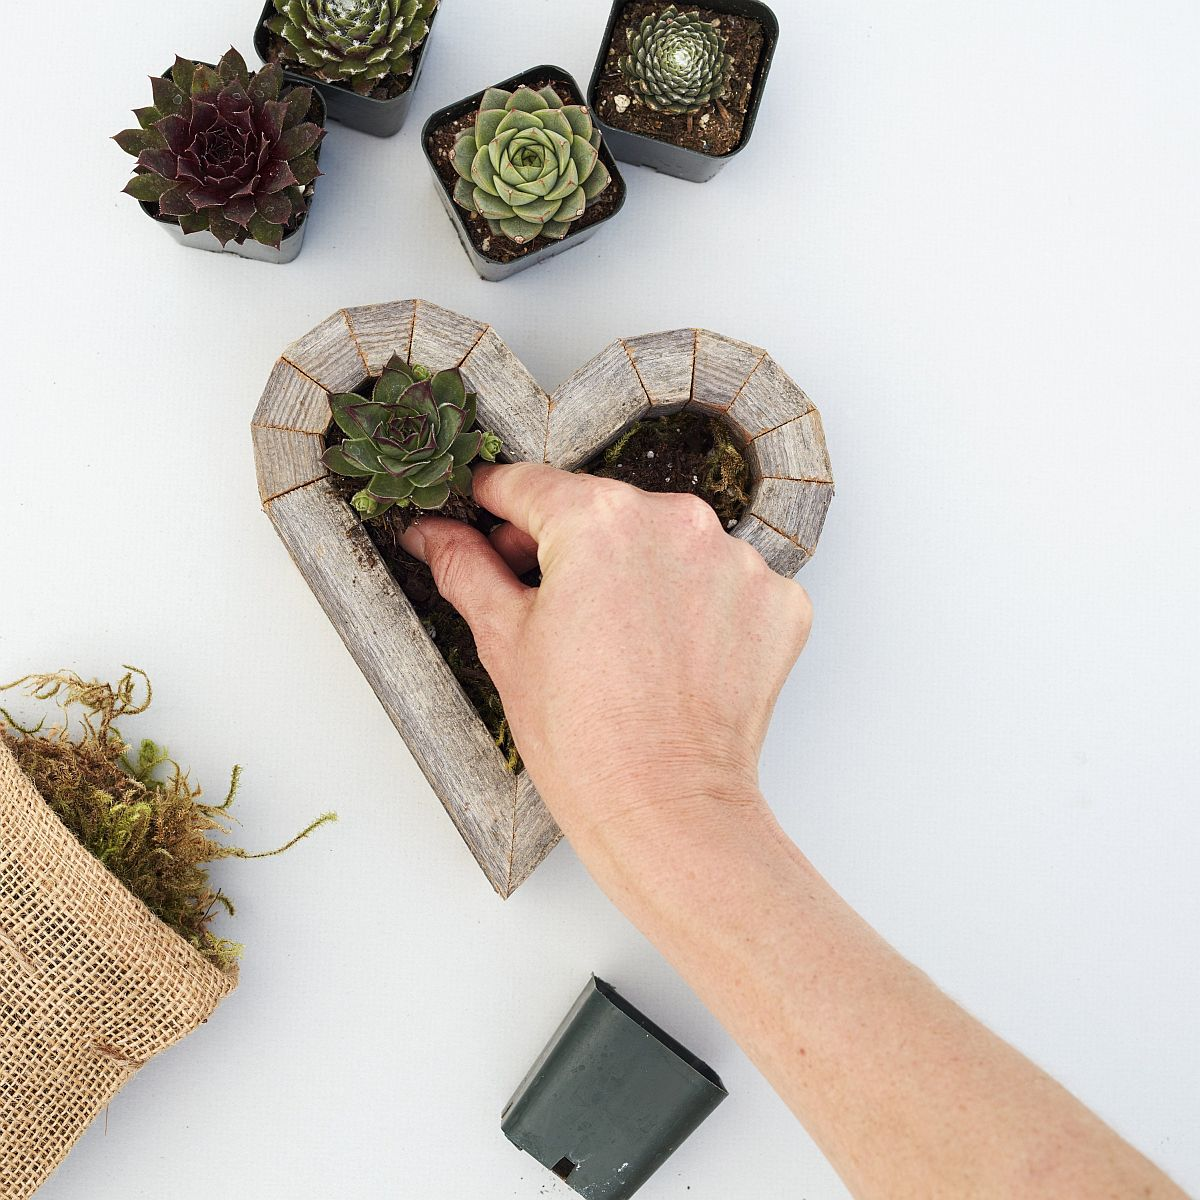 Redwood Heart Planter from Succulent Gardens